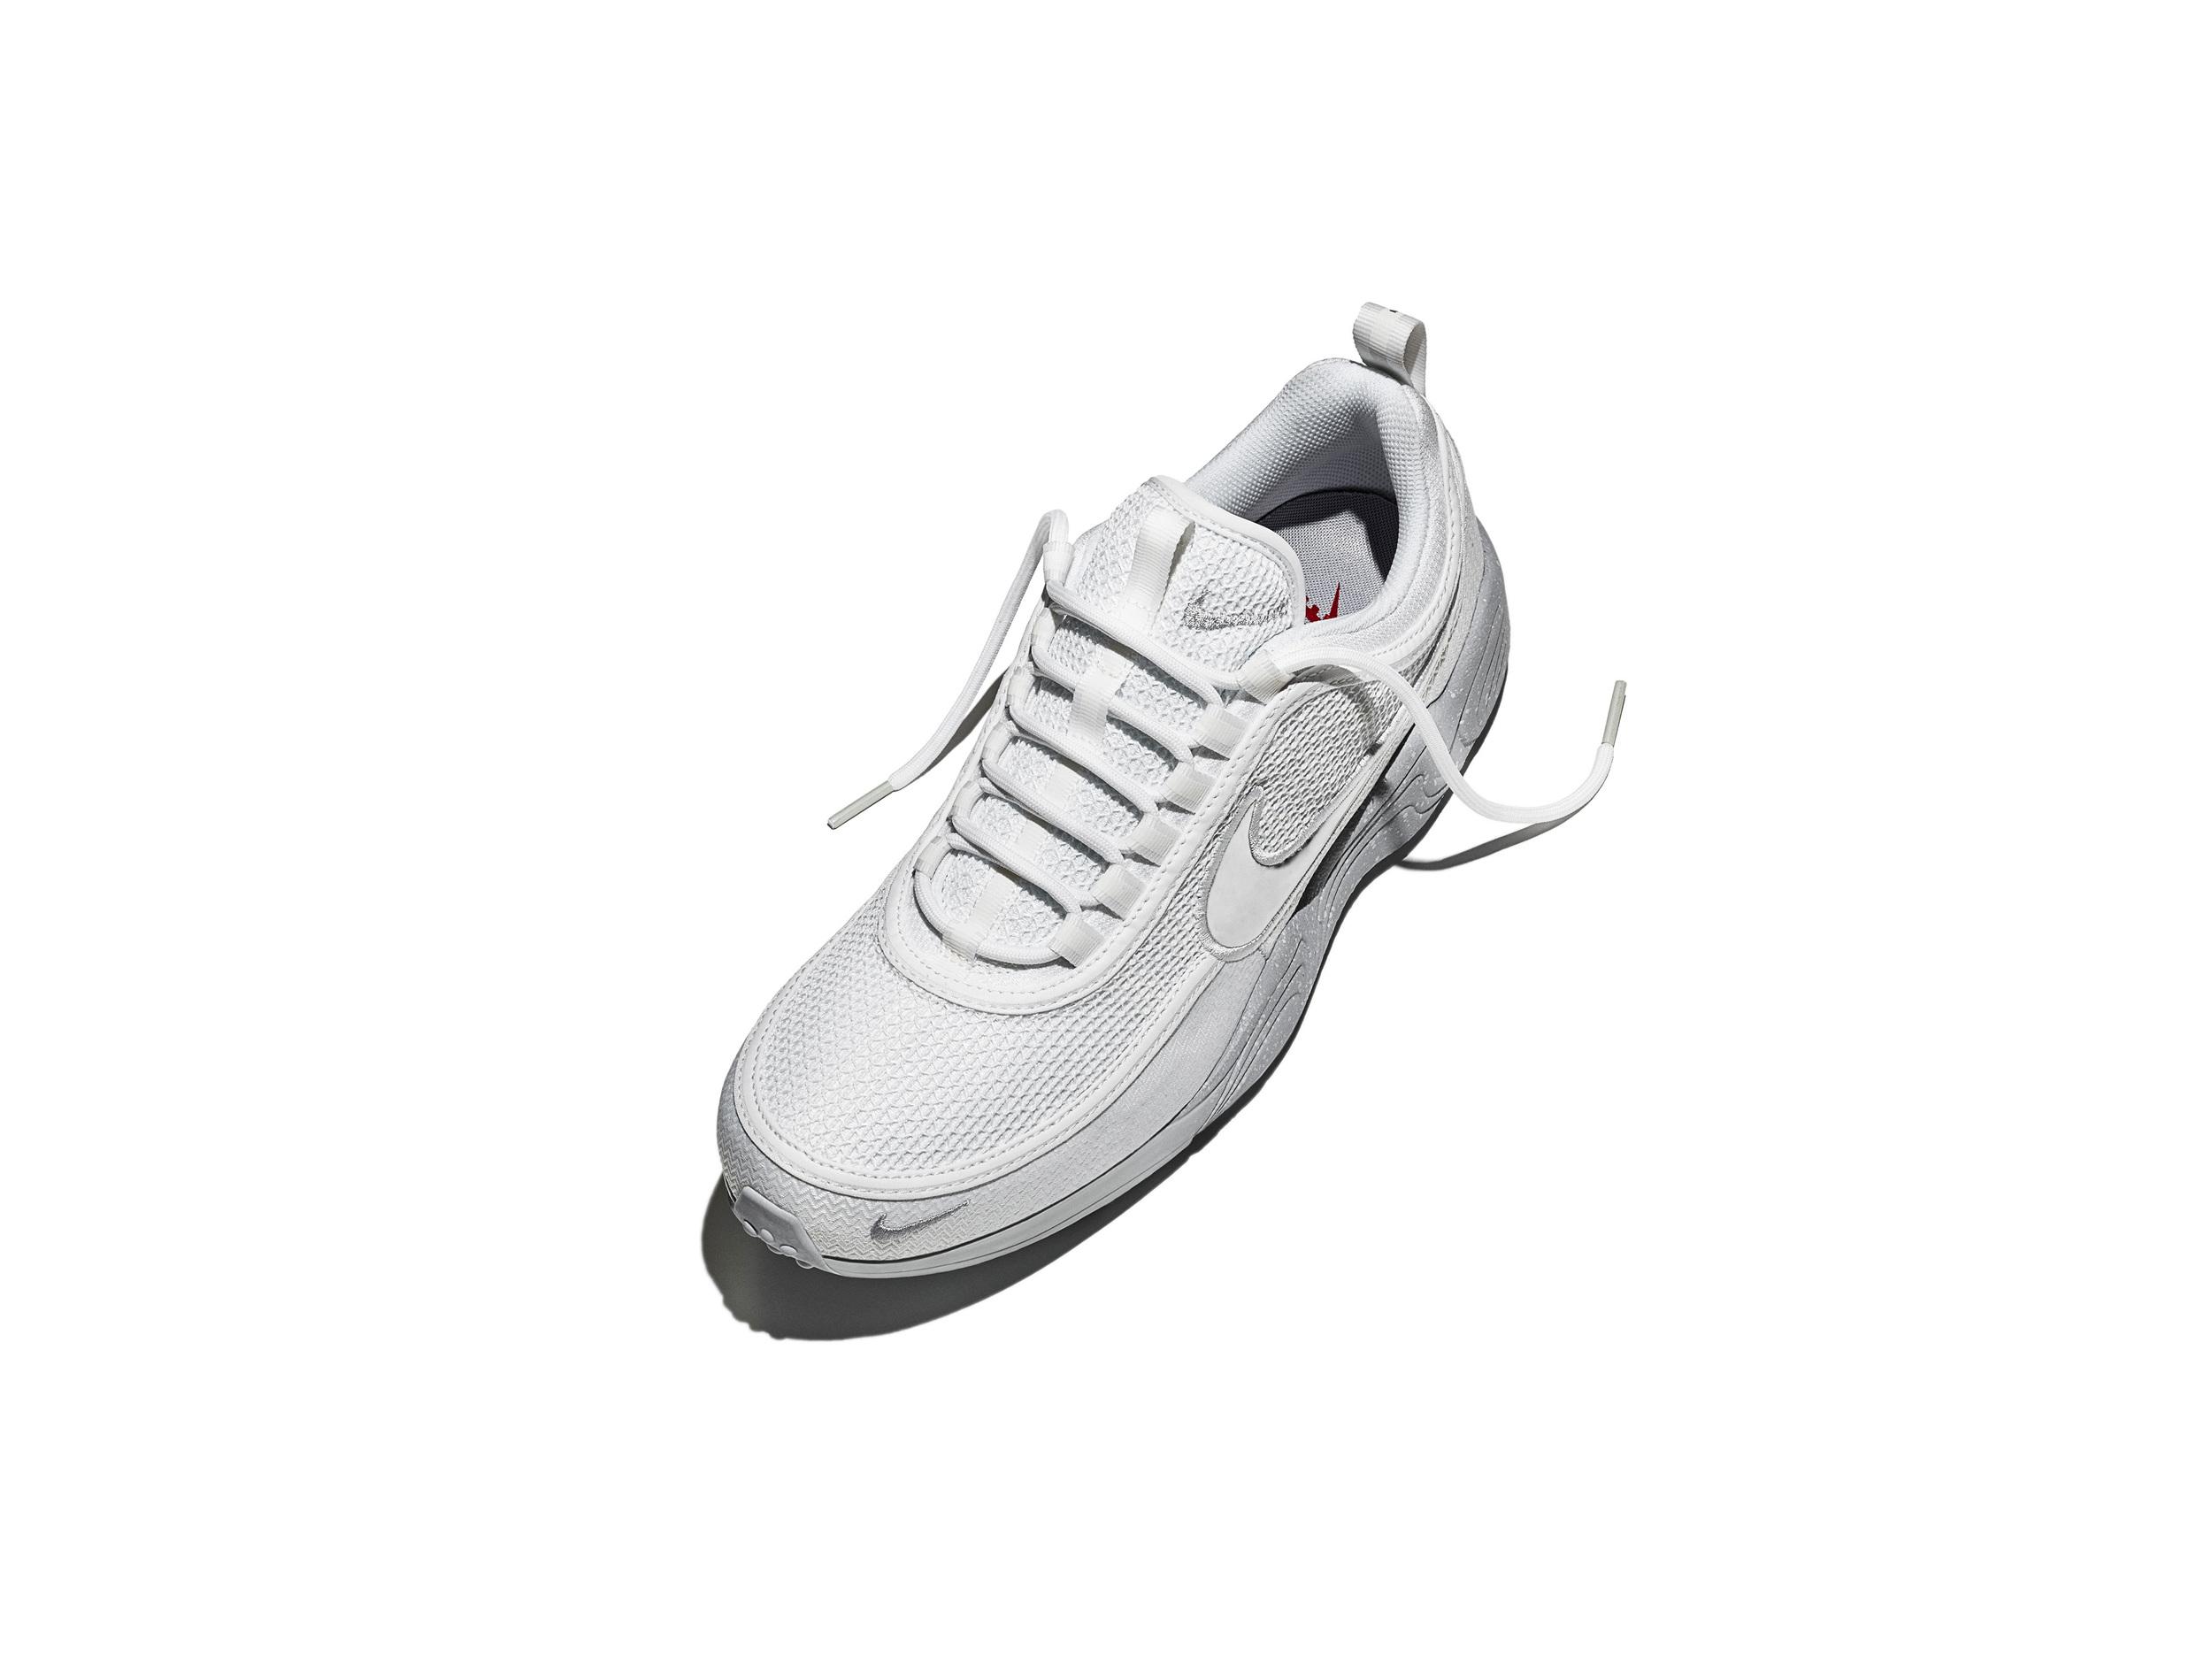 Nike_LAB_Spiridon_whtgry_HERO_01_60177.jpg